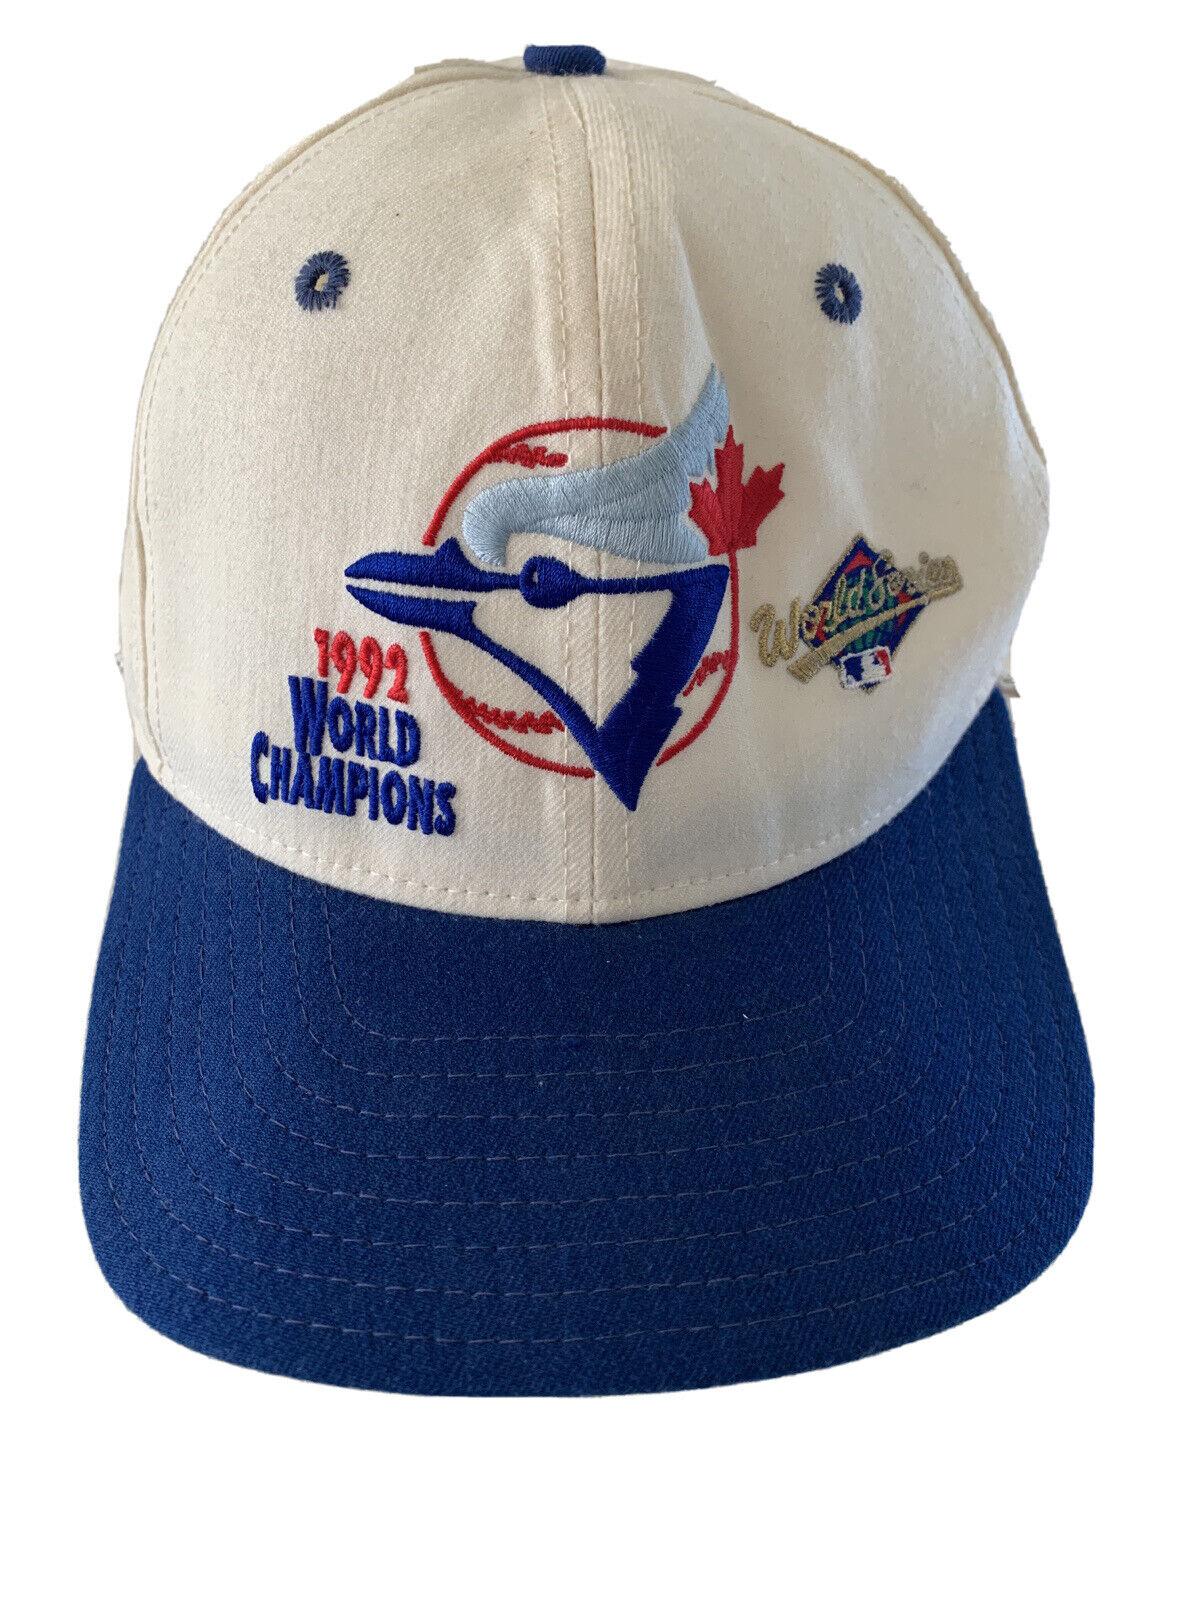 Toronto Blue Jays 1992 World Champions snapback hat M-L USA MADE